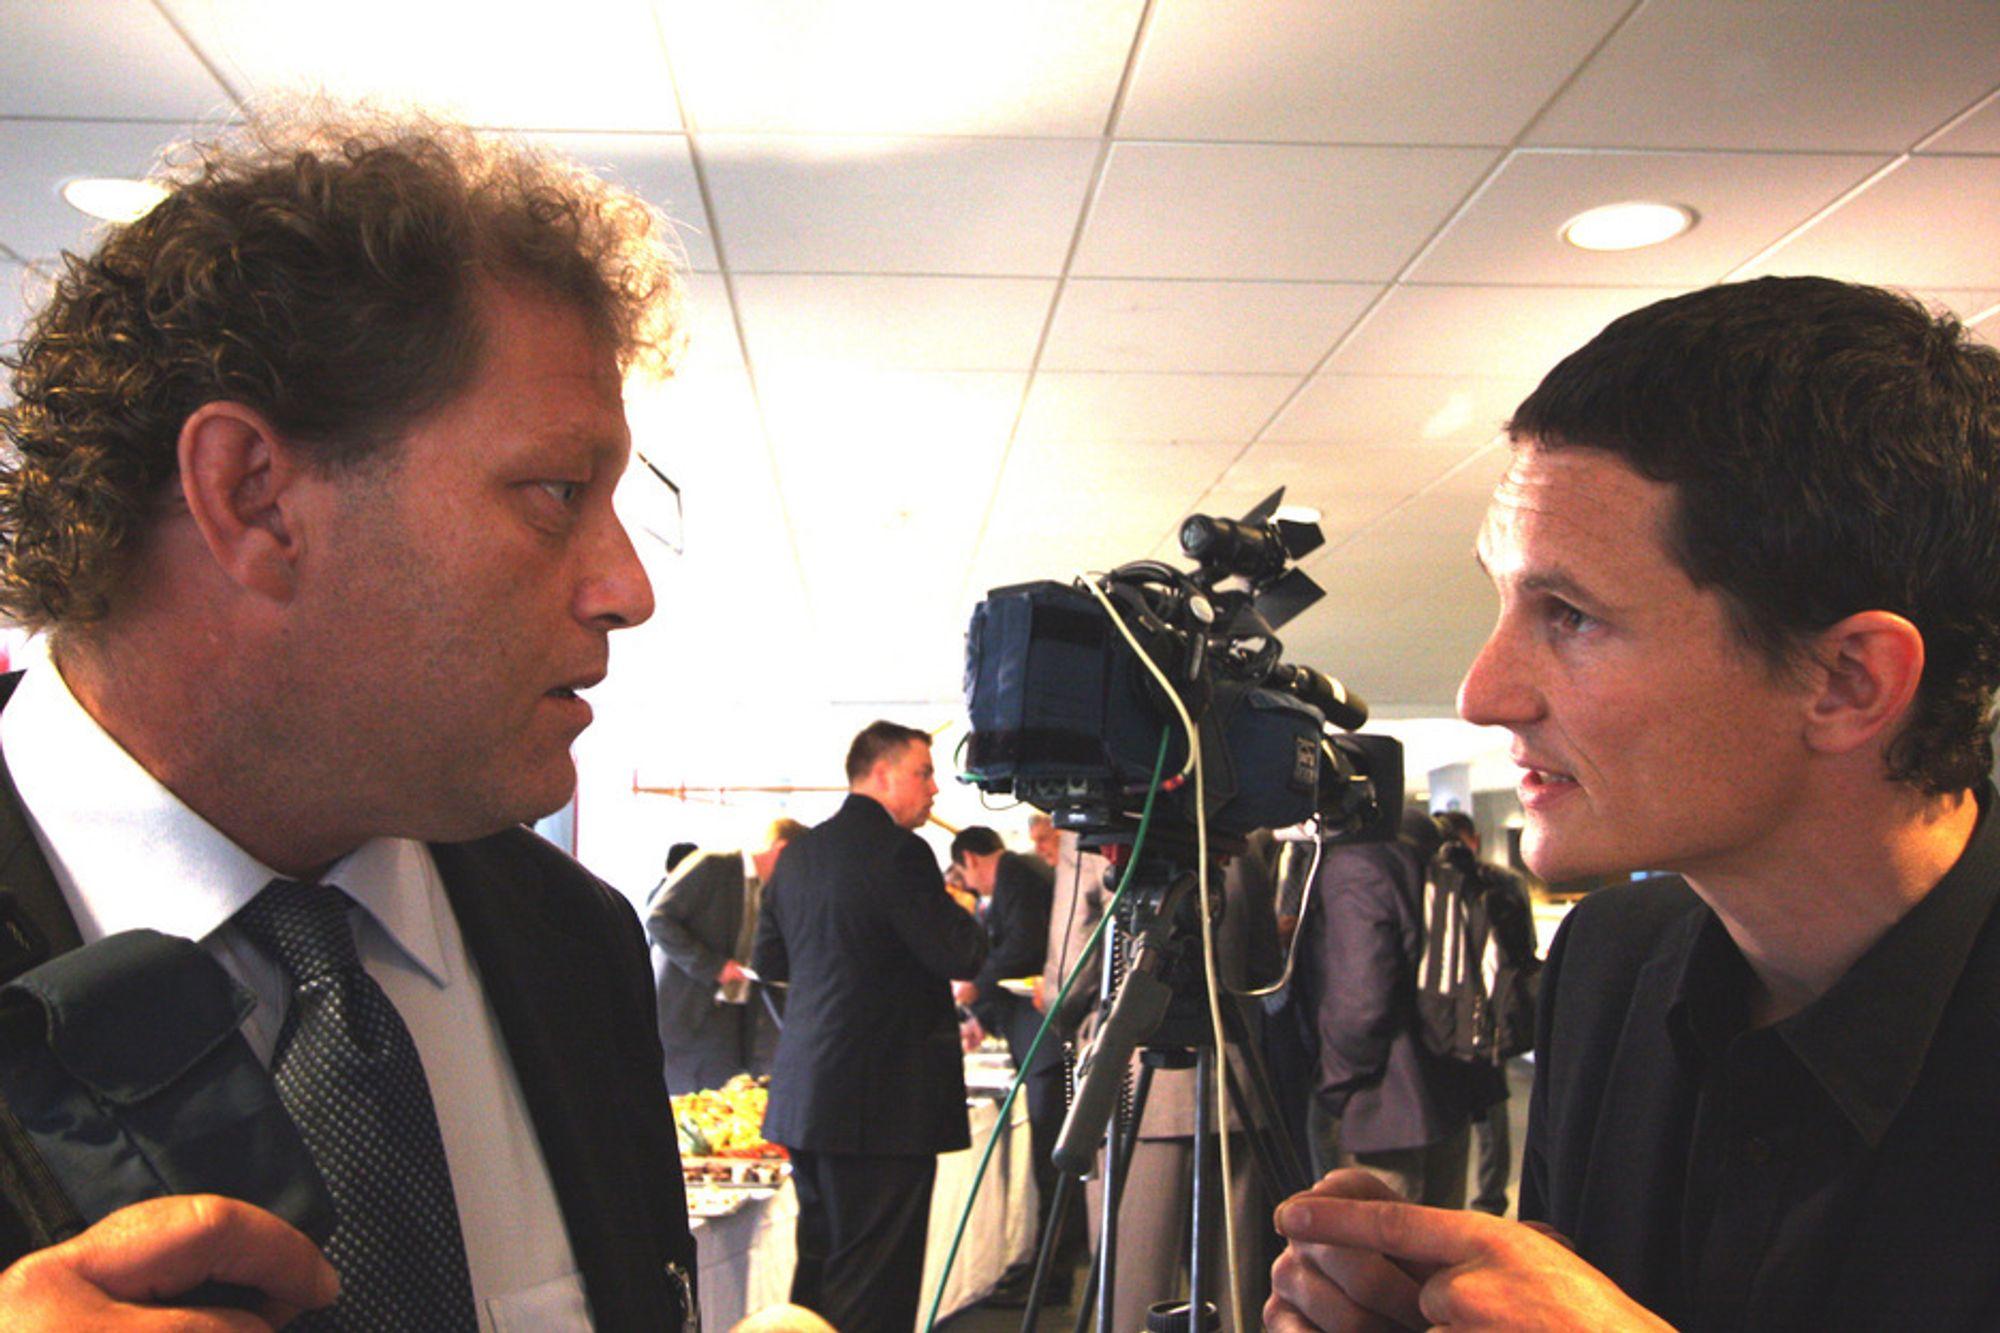 KRITISKE: Bellonas Frederic Hauge og Greenpeace-leder Truls Gulowsen var alt annet enn enige på klimakonferansen i Bergen i går.